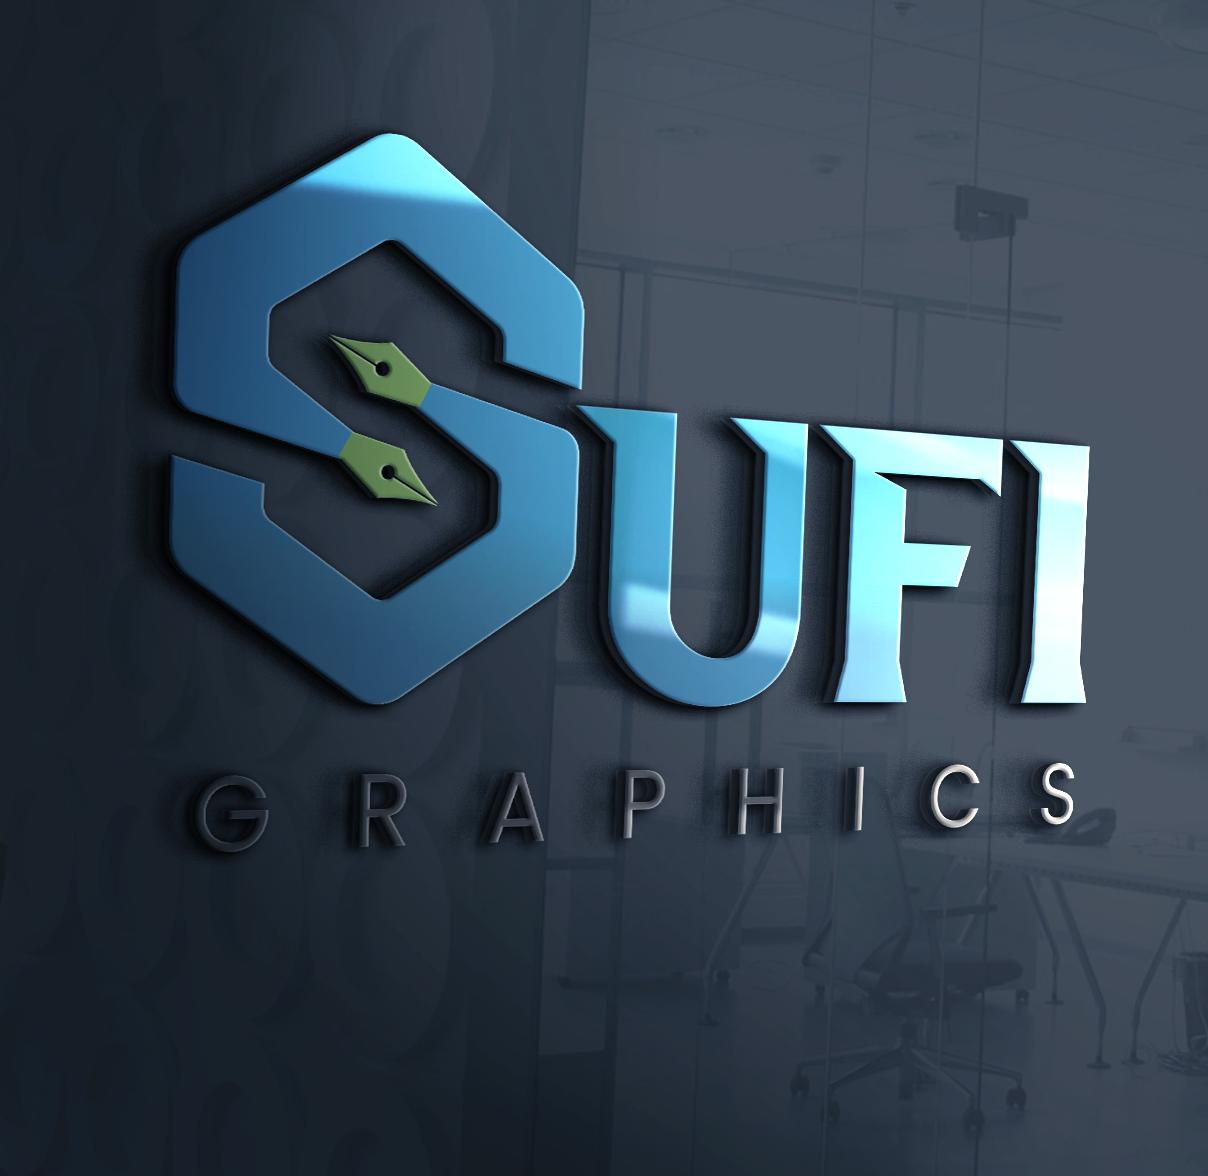 Sufi Graphics